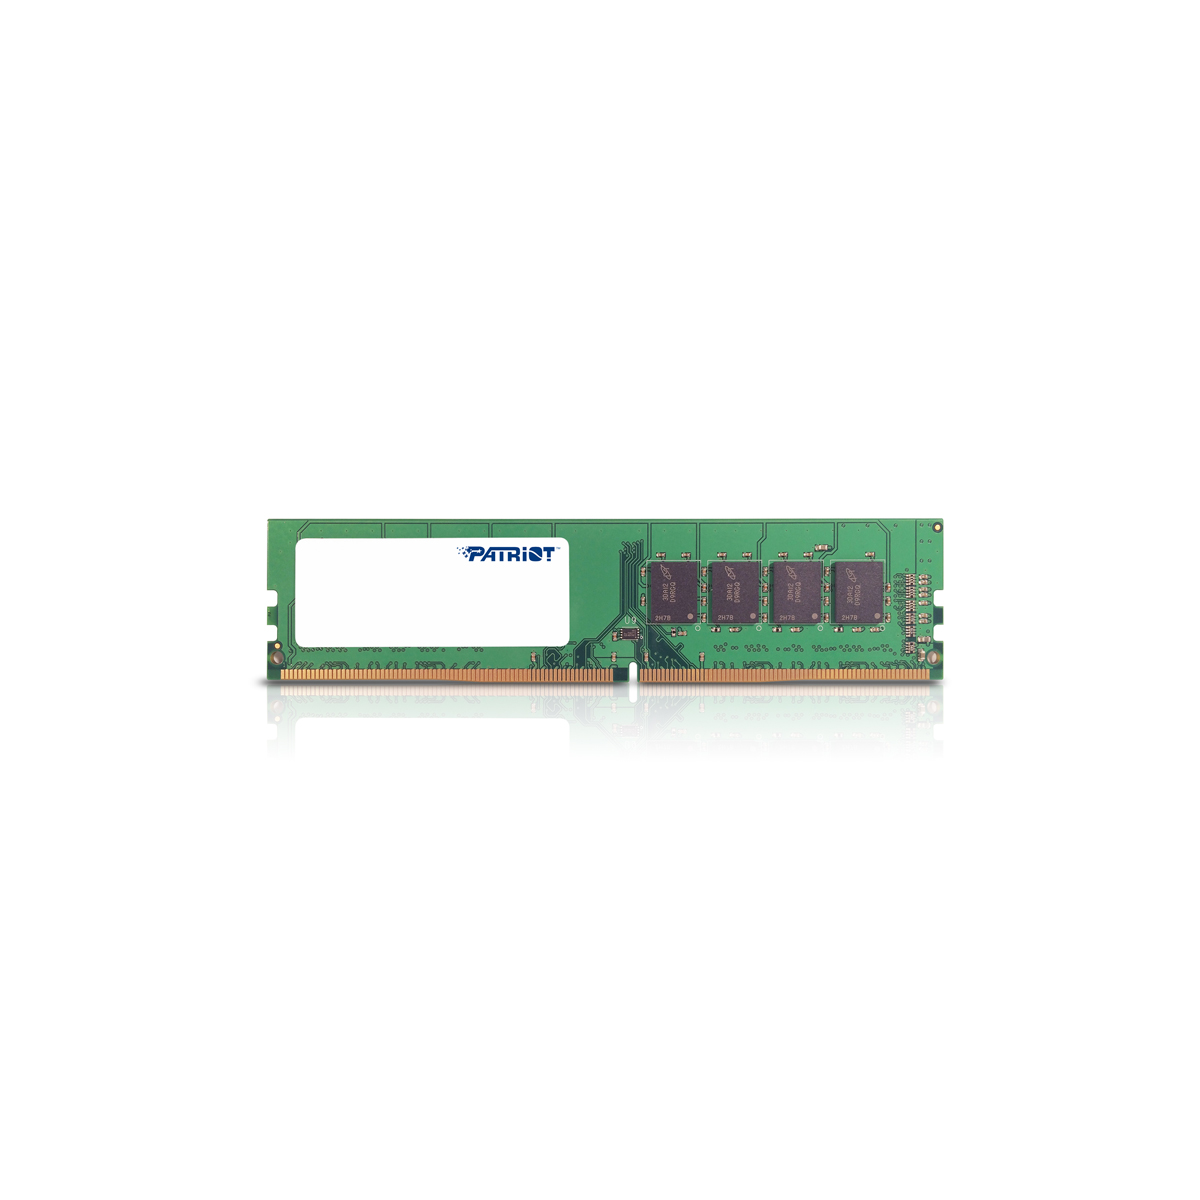 16GB DDR4-2133MHz Patriot CL15, kit 2x8GB